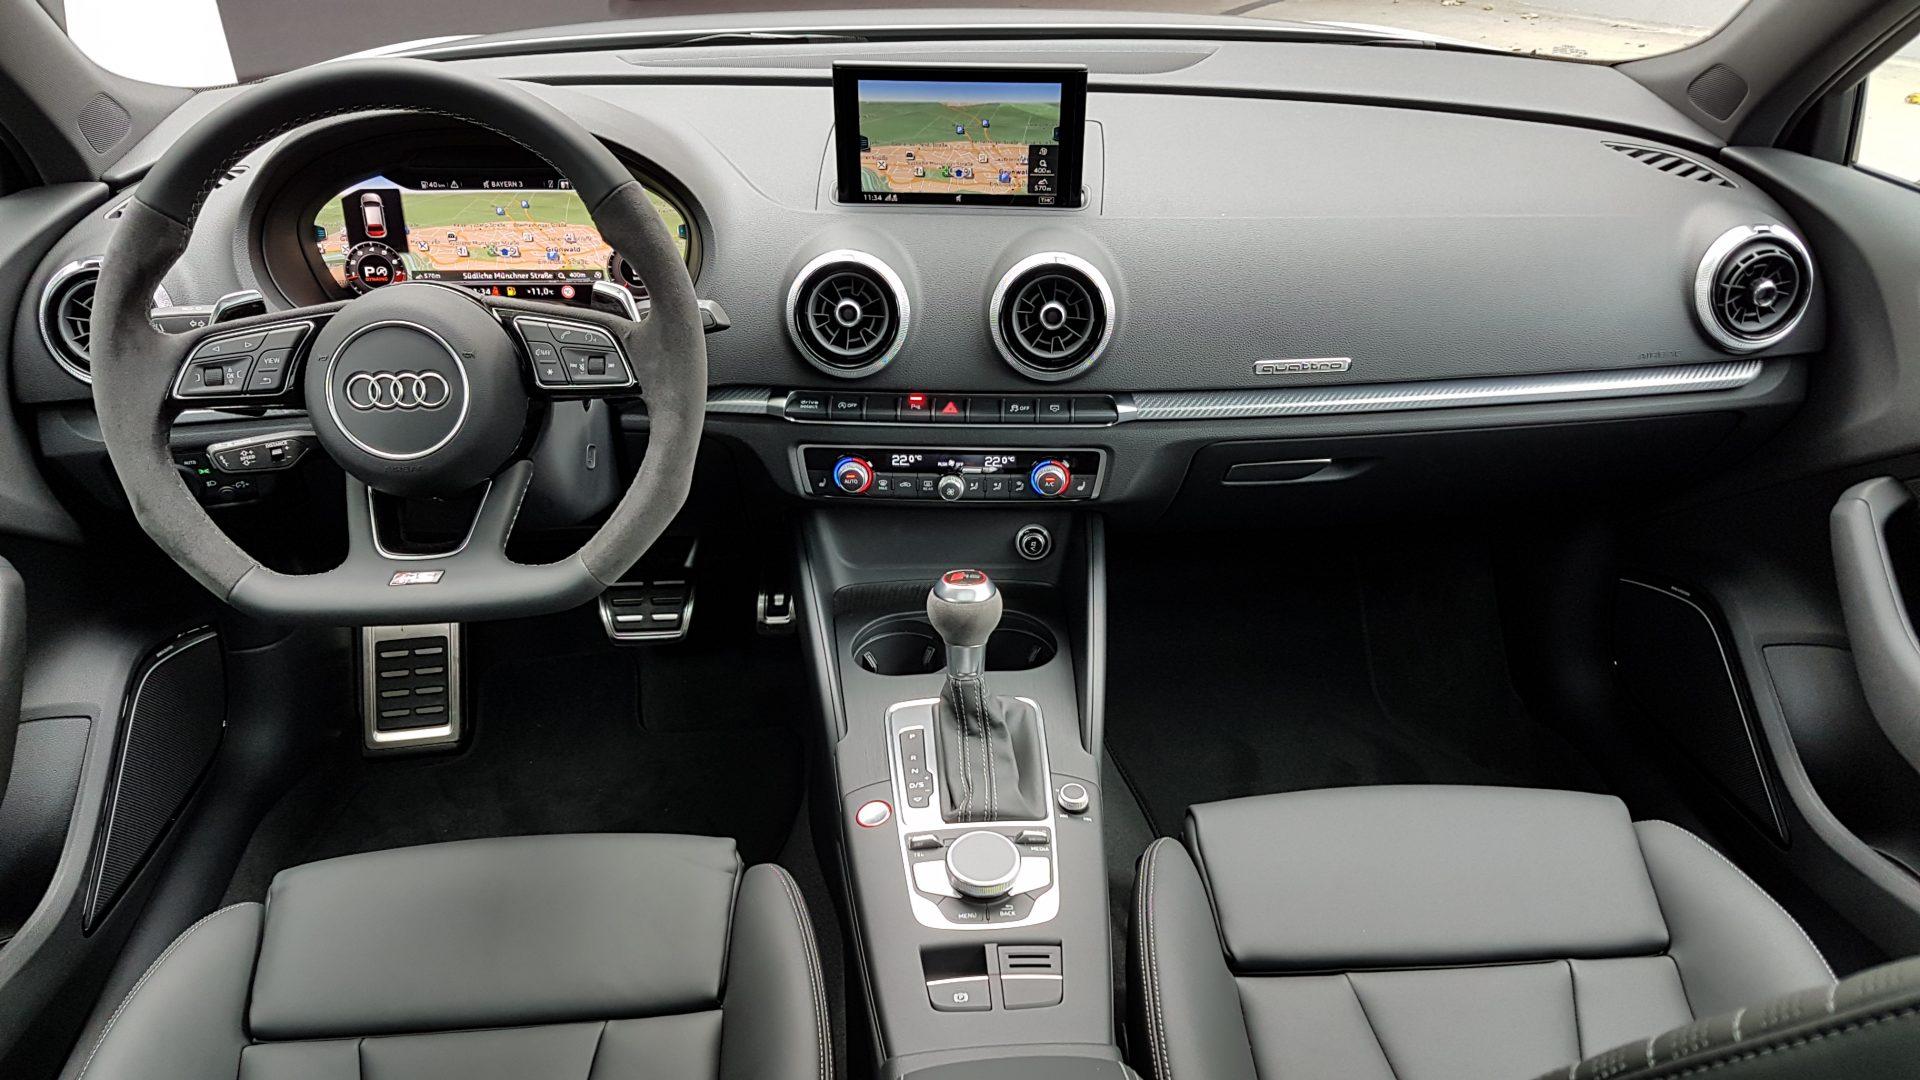 AIL Audi RS3 Sportback Matrix Virtual Panorama 8